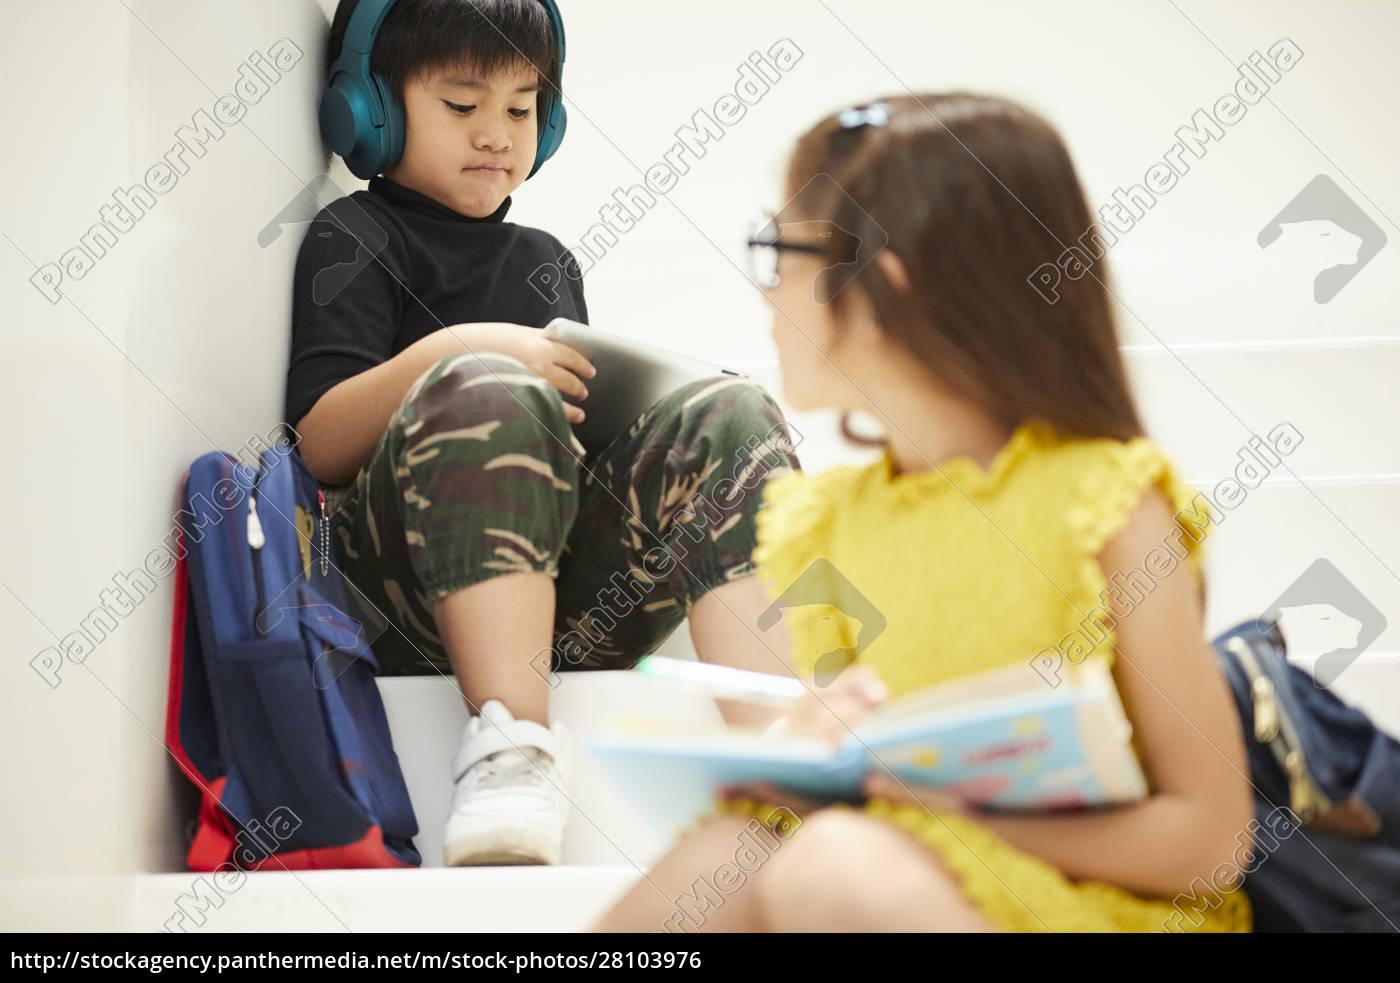 schoolchild, school, life - 28103976